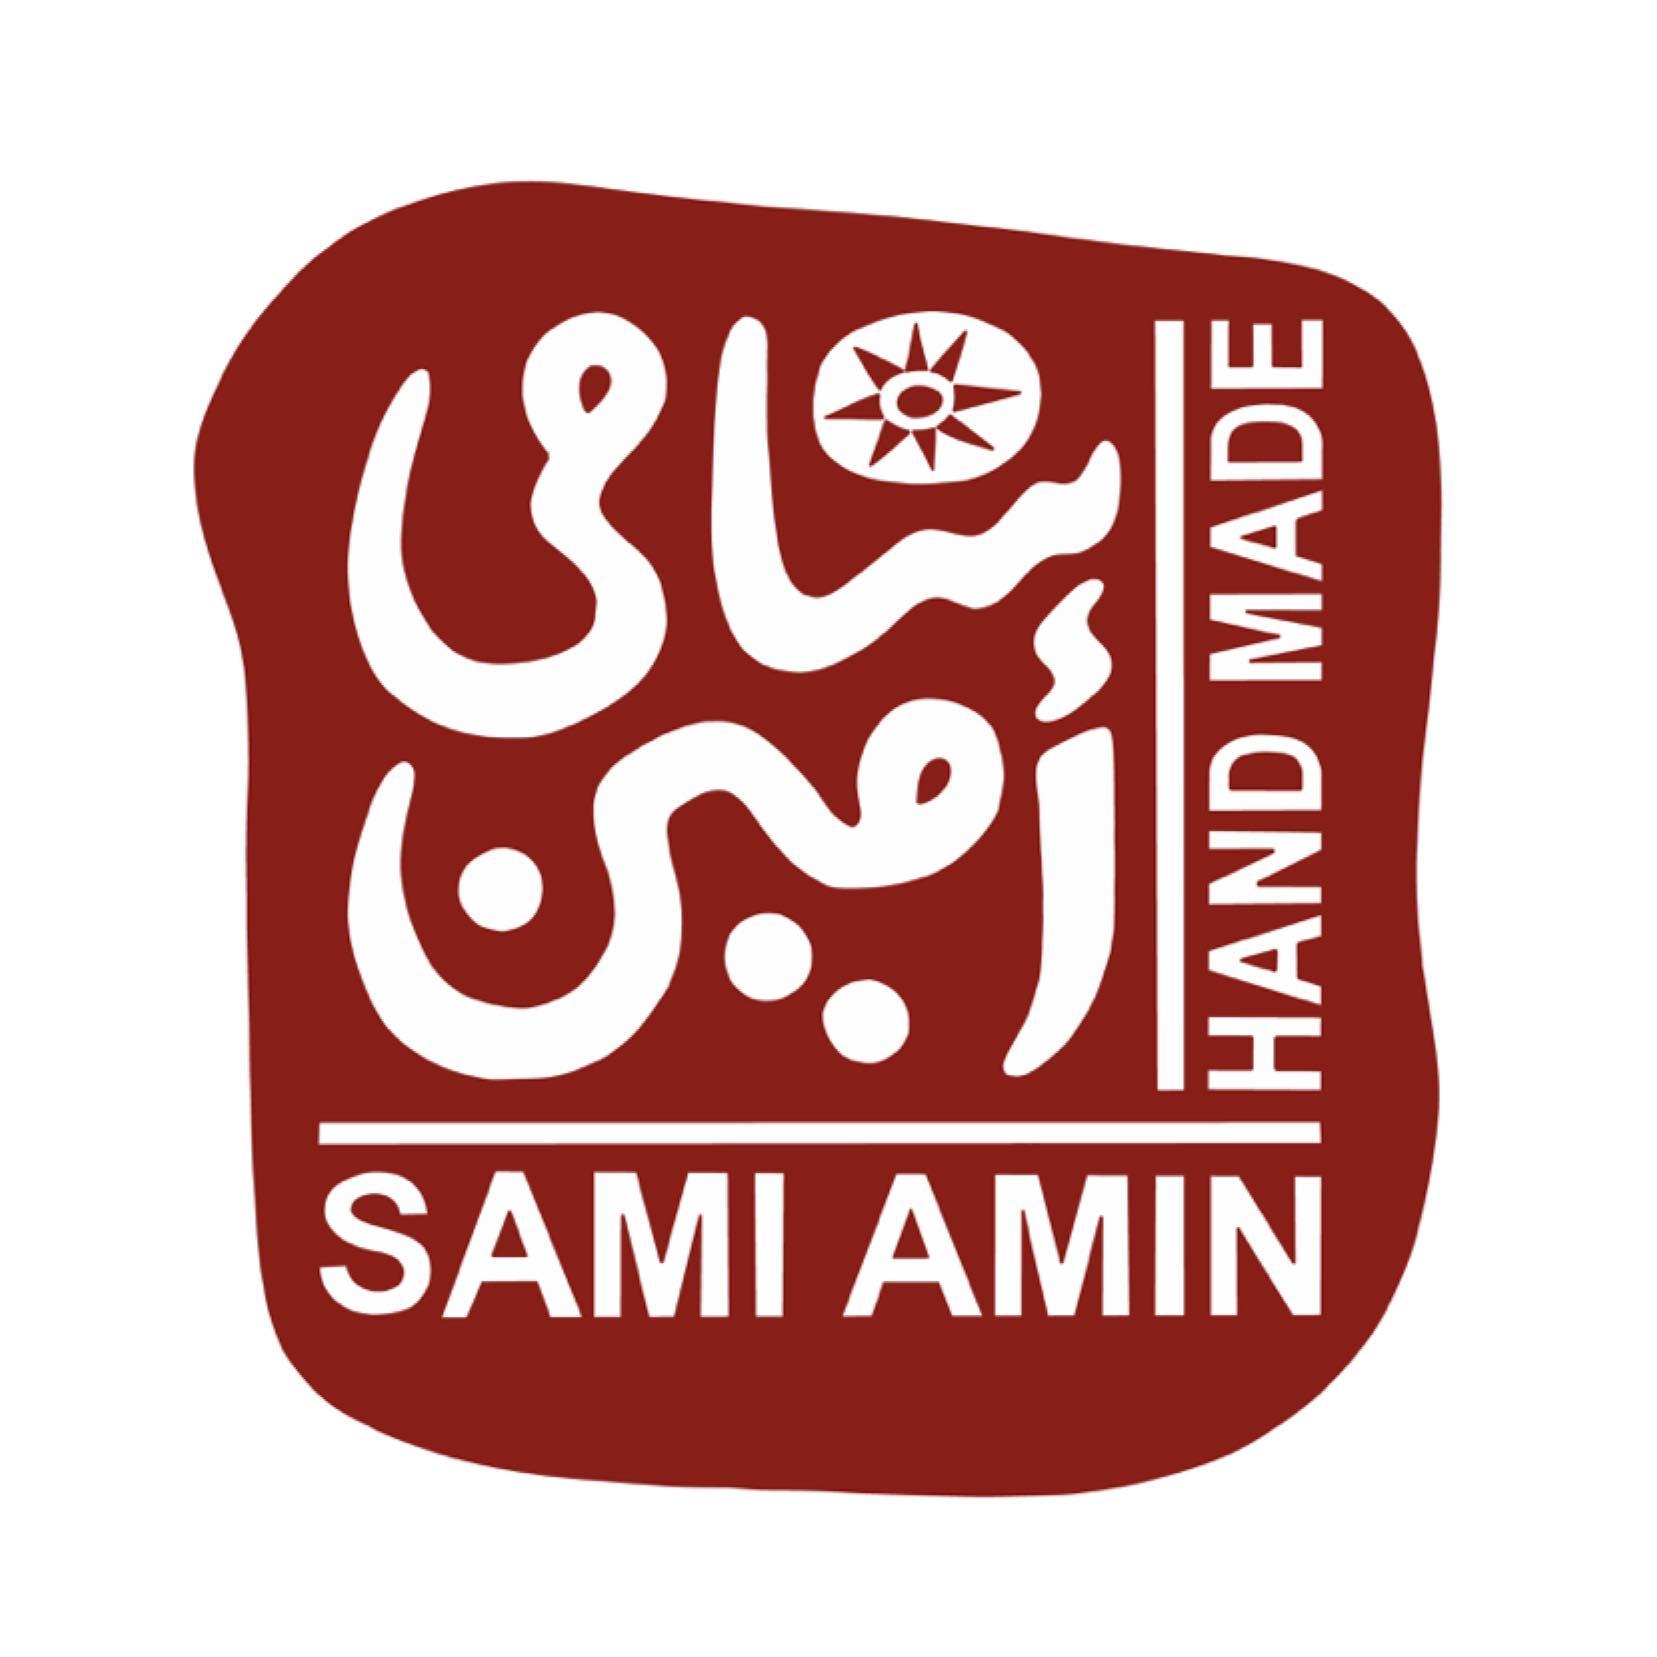 سامي أمين ديزاينز Sami Amin Designs